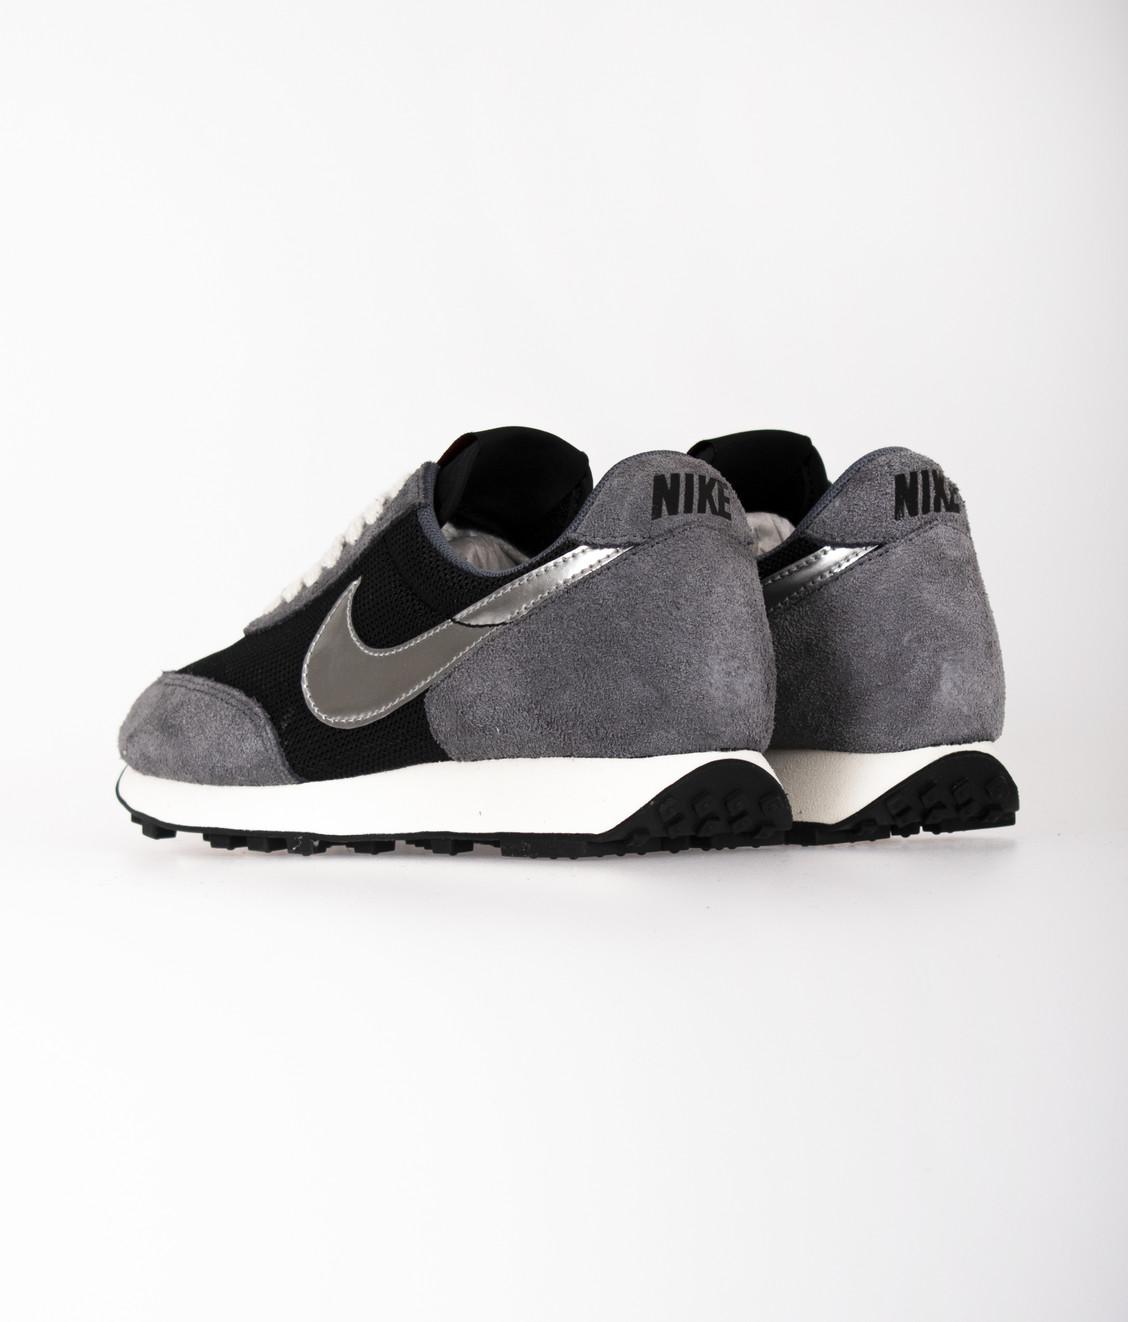 Nike Nike Daybreak SP Black Metallic Silver